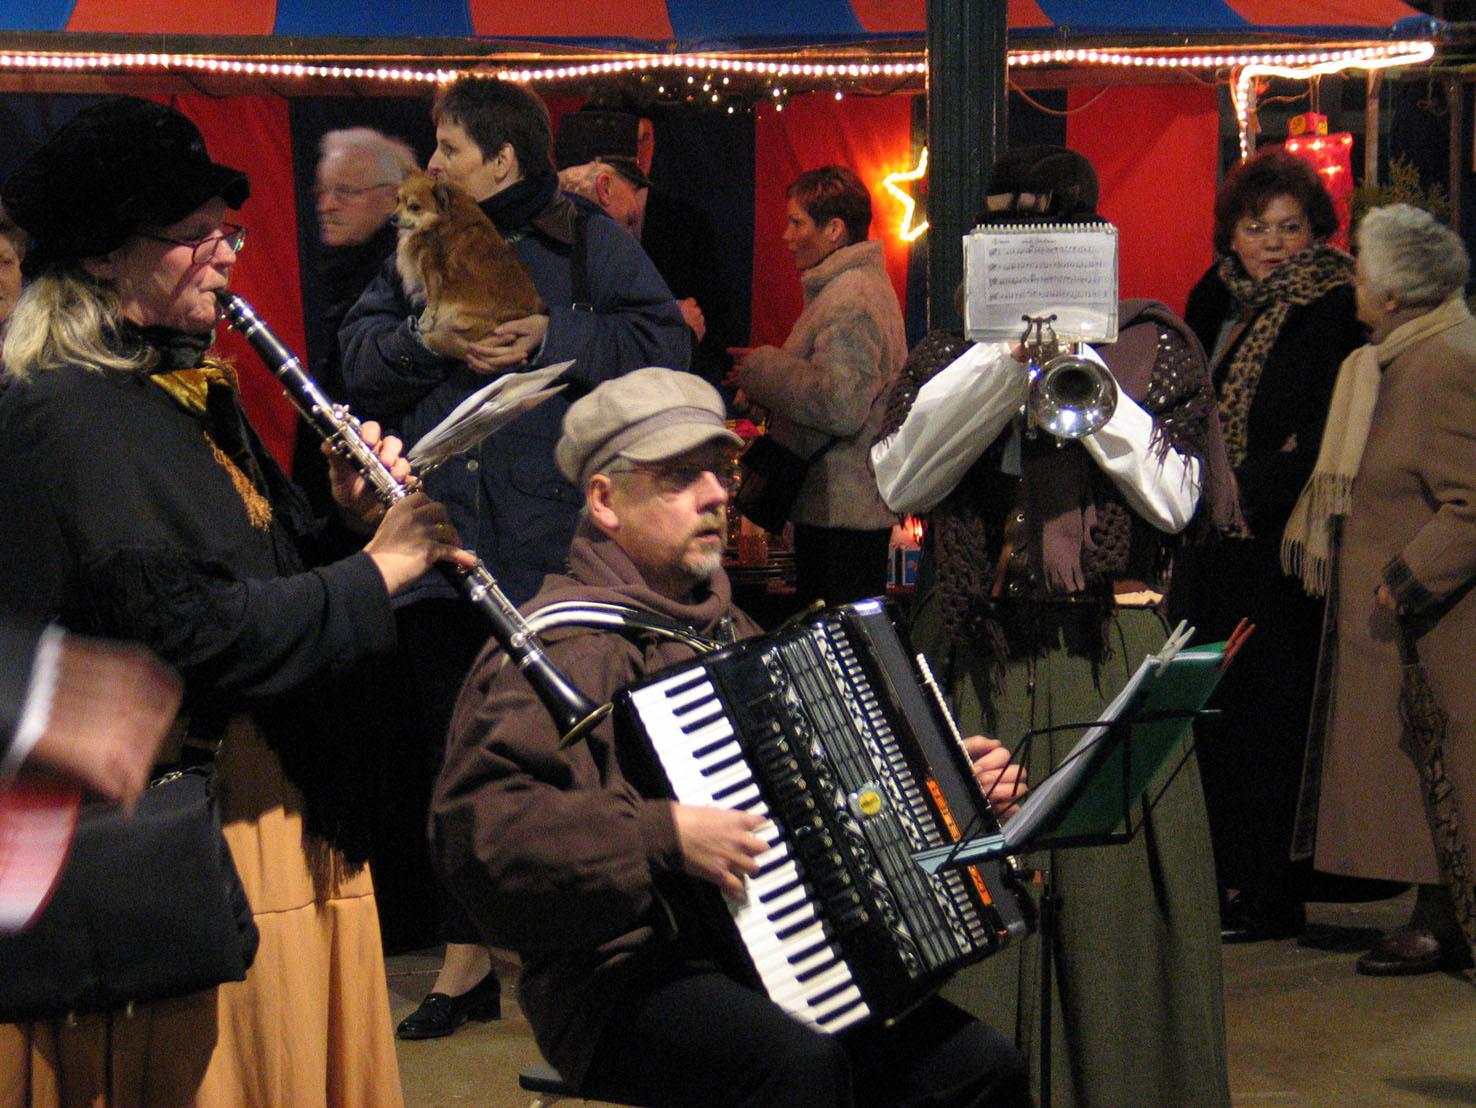 145 - Kerstmarkt Helmond 2003.jpg